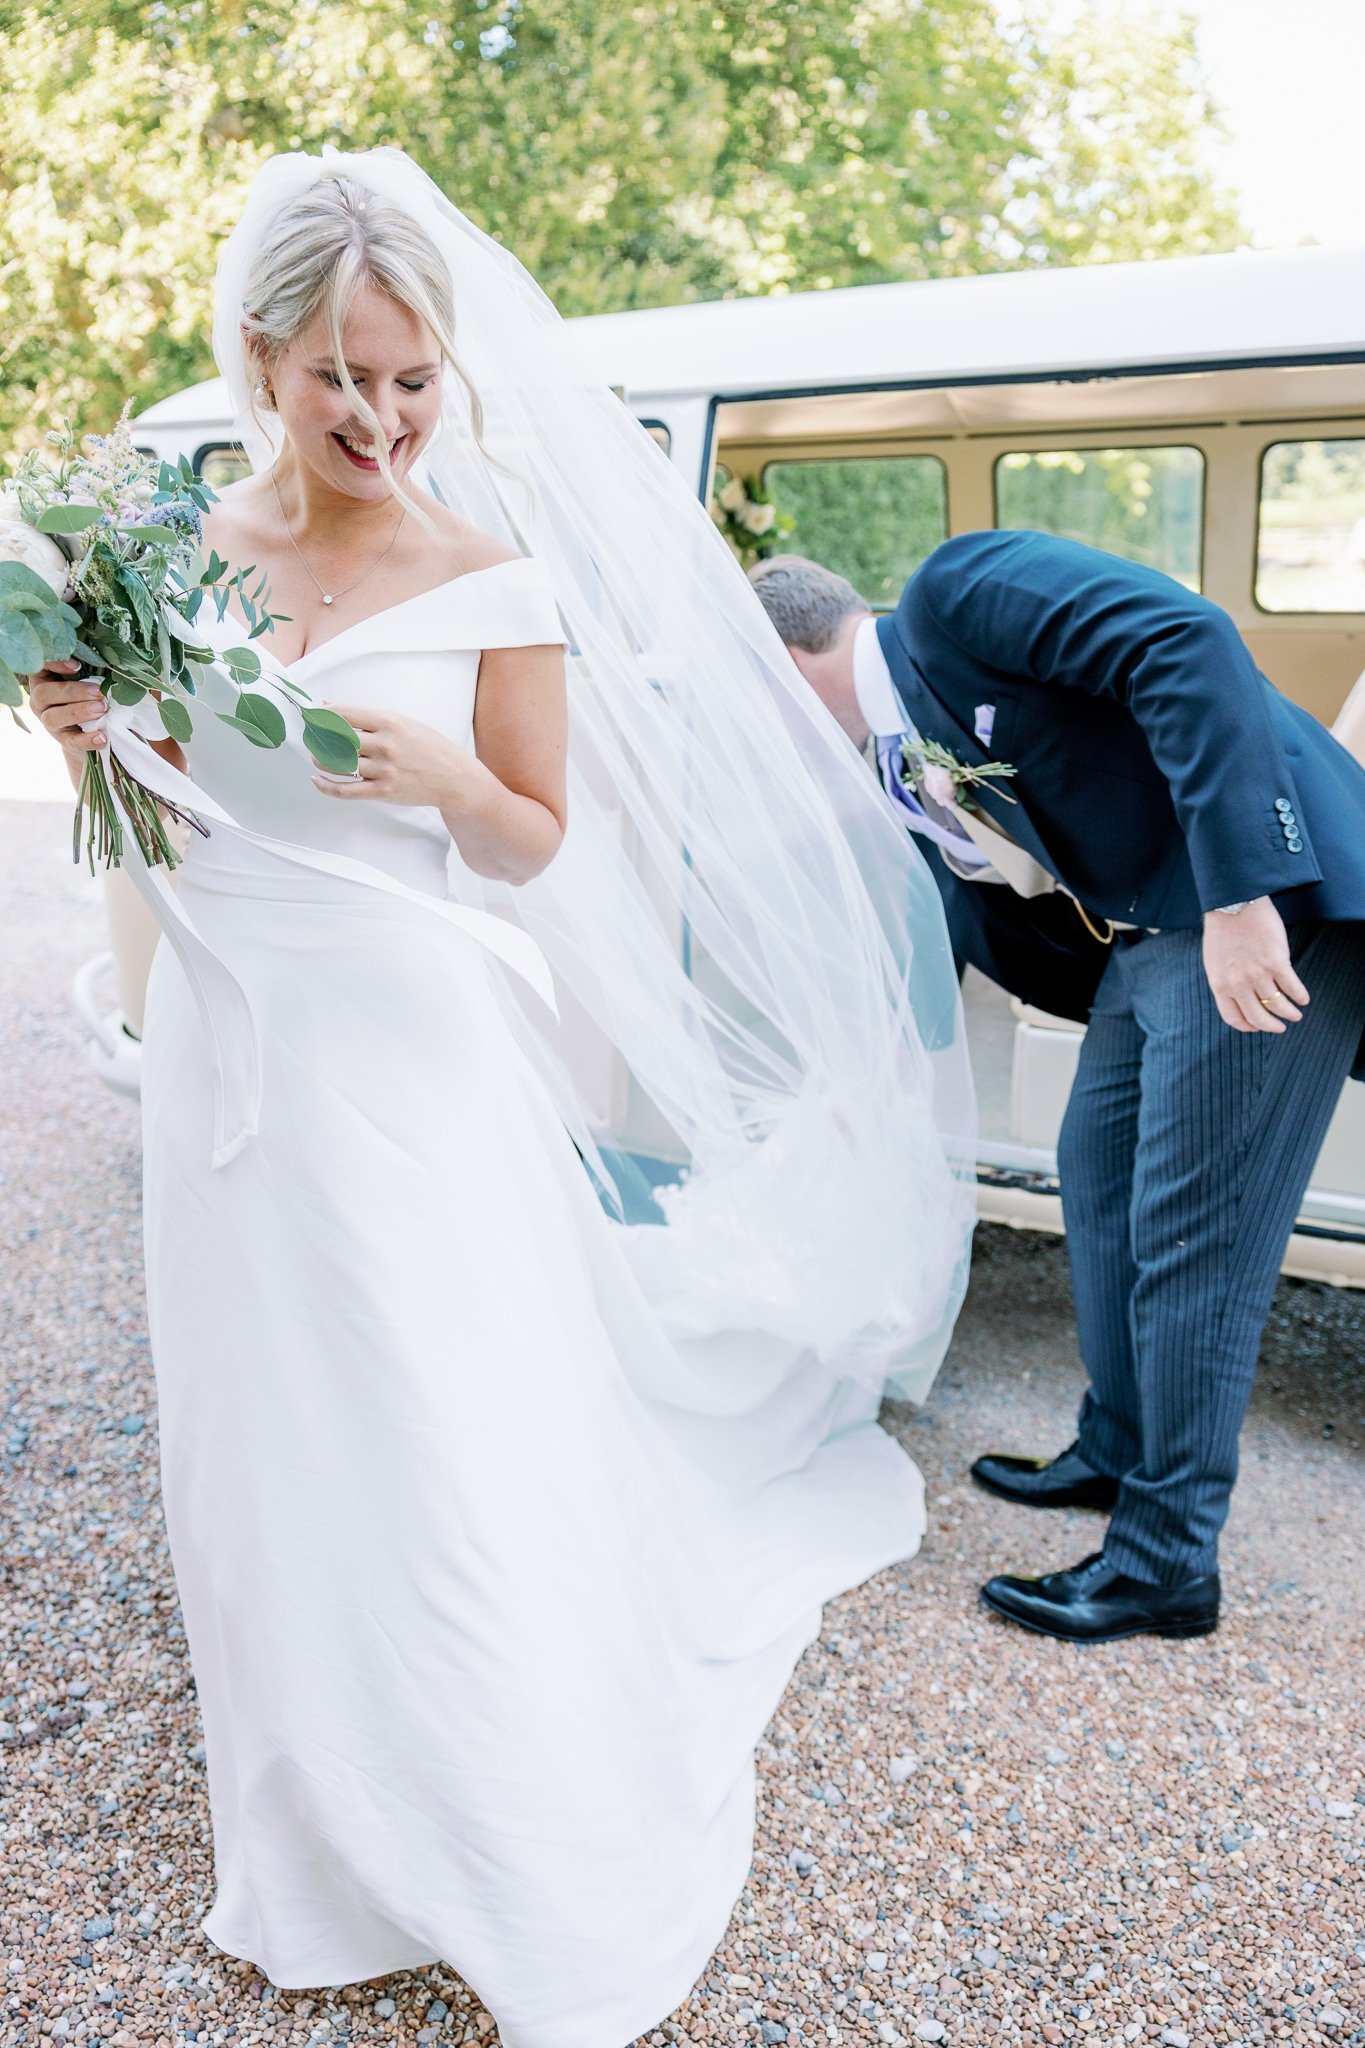 Bride arrival at Brickwall House wedding venue in Rye